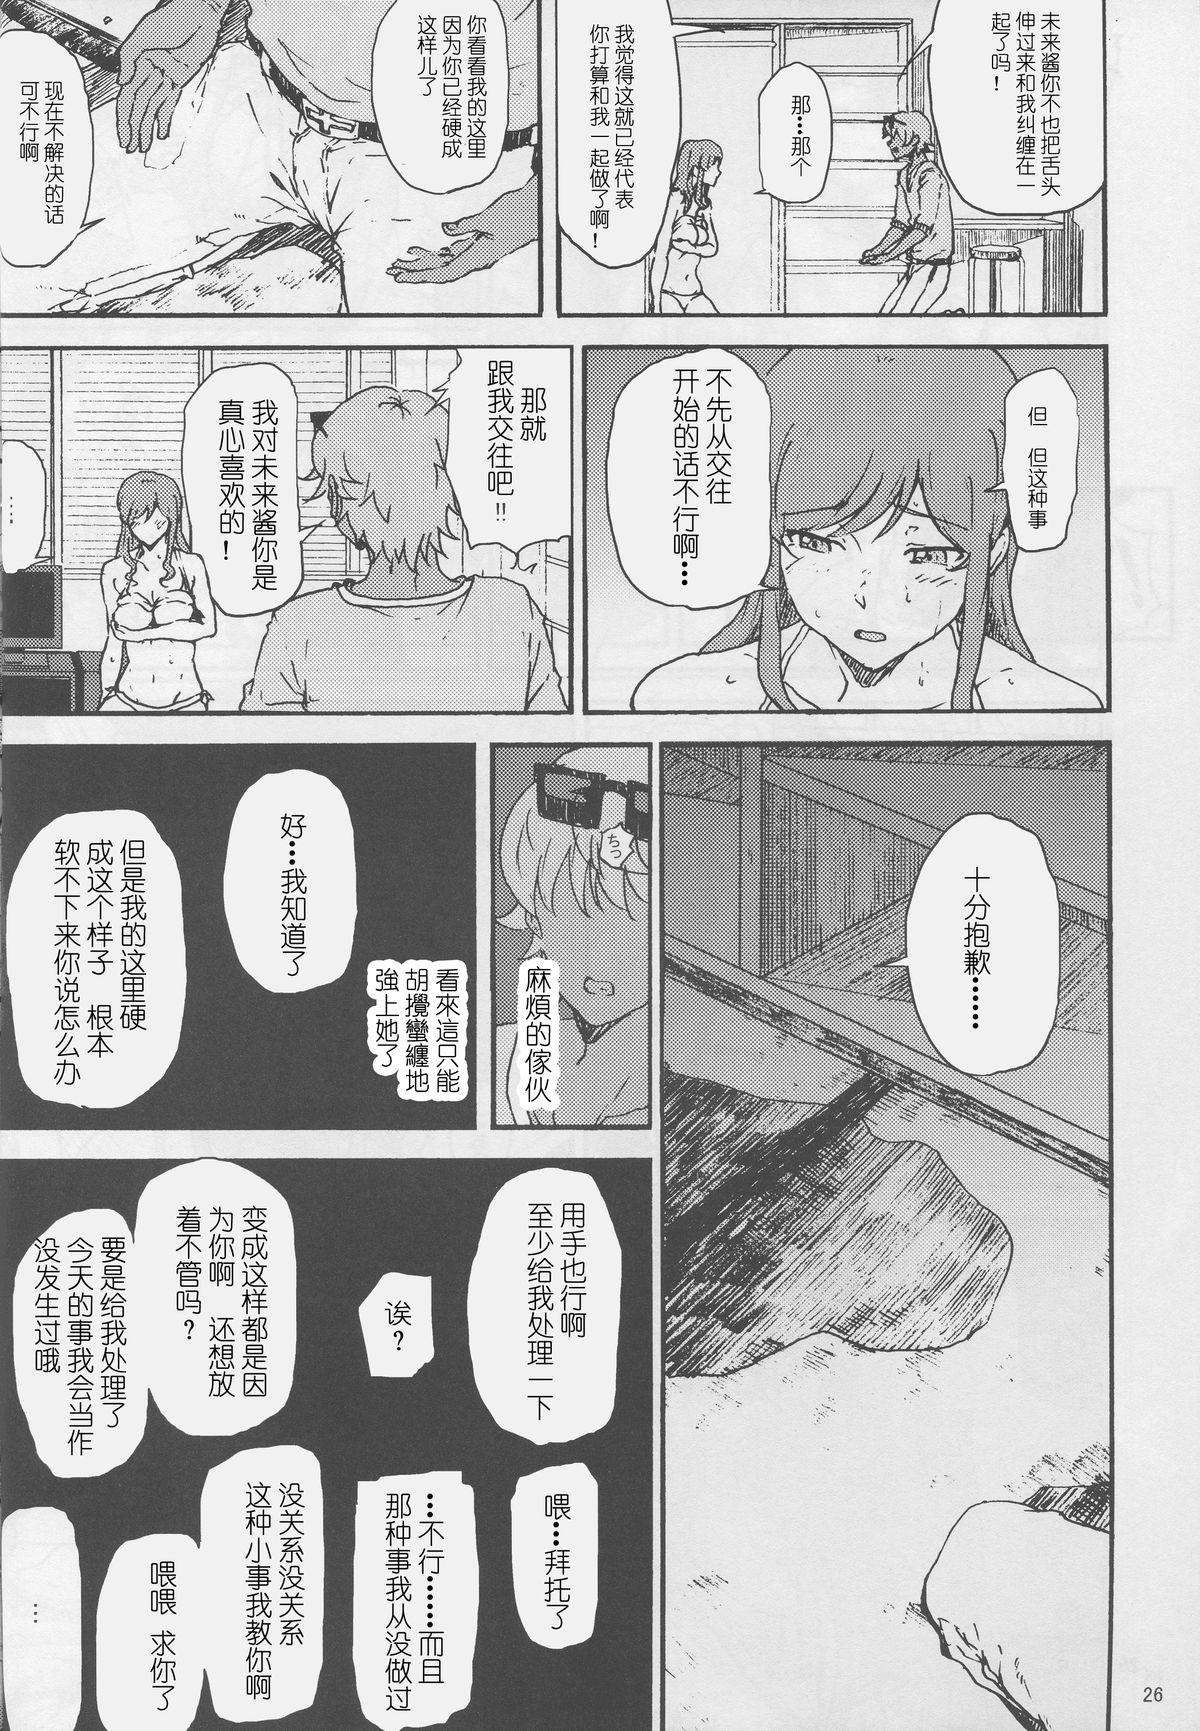 Mirai-chan ga Sandaime SGOCK no Leader ni Damasare Yarechau Hon 26